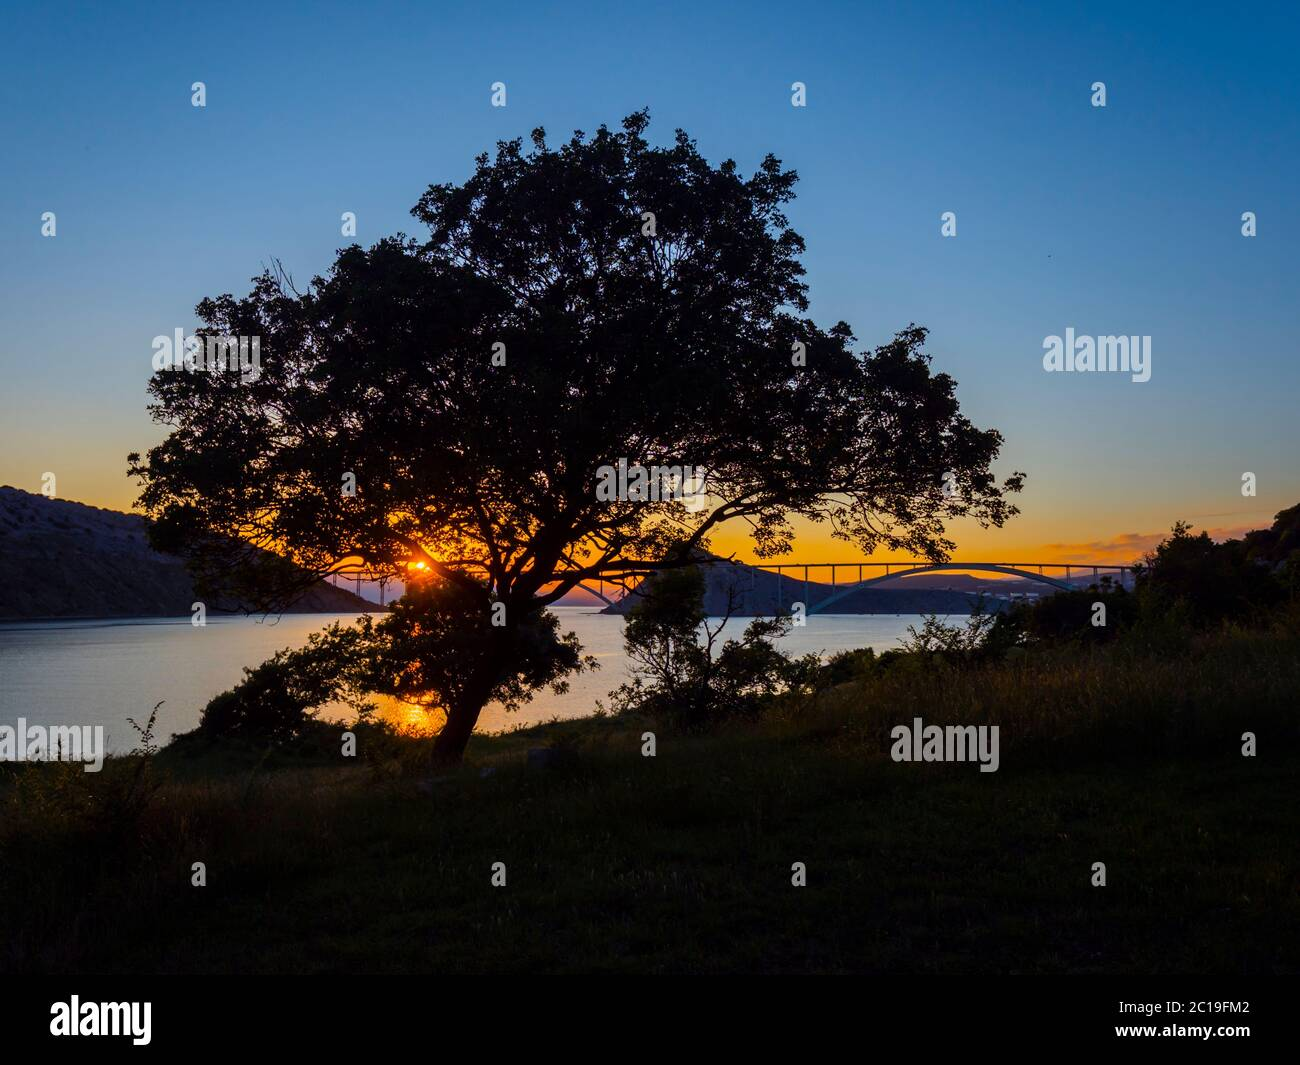 Sunset landscape bridge mainland to island Krk Croatia see through dominant tree Stock Photo